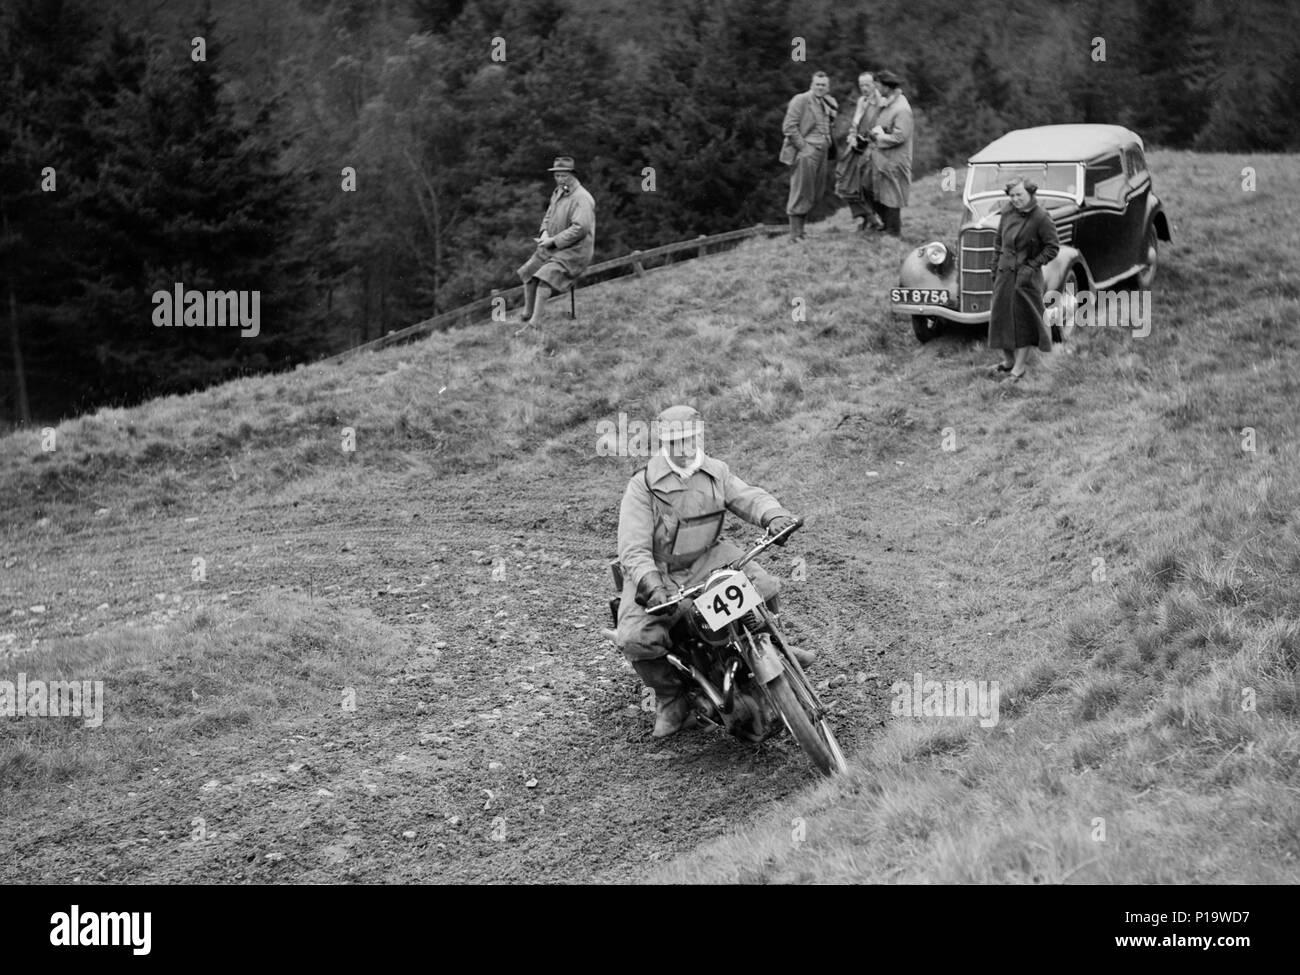 347 cc Ariel of F Gooding competing in the MCC Edinburgh Trial, Roxburghshire, Scotland, 1938. Artist: Bill Brunell. - Stock Image